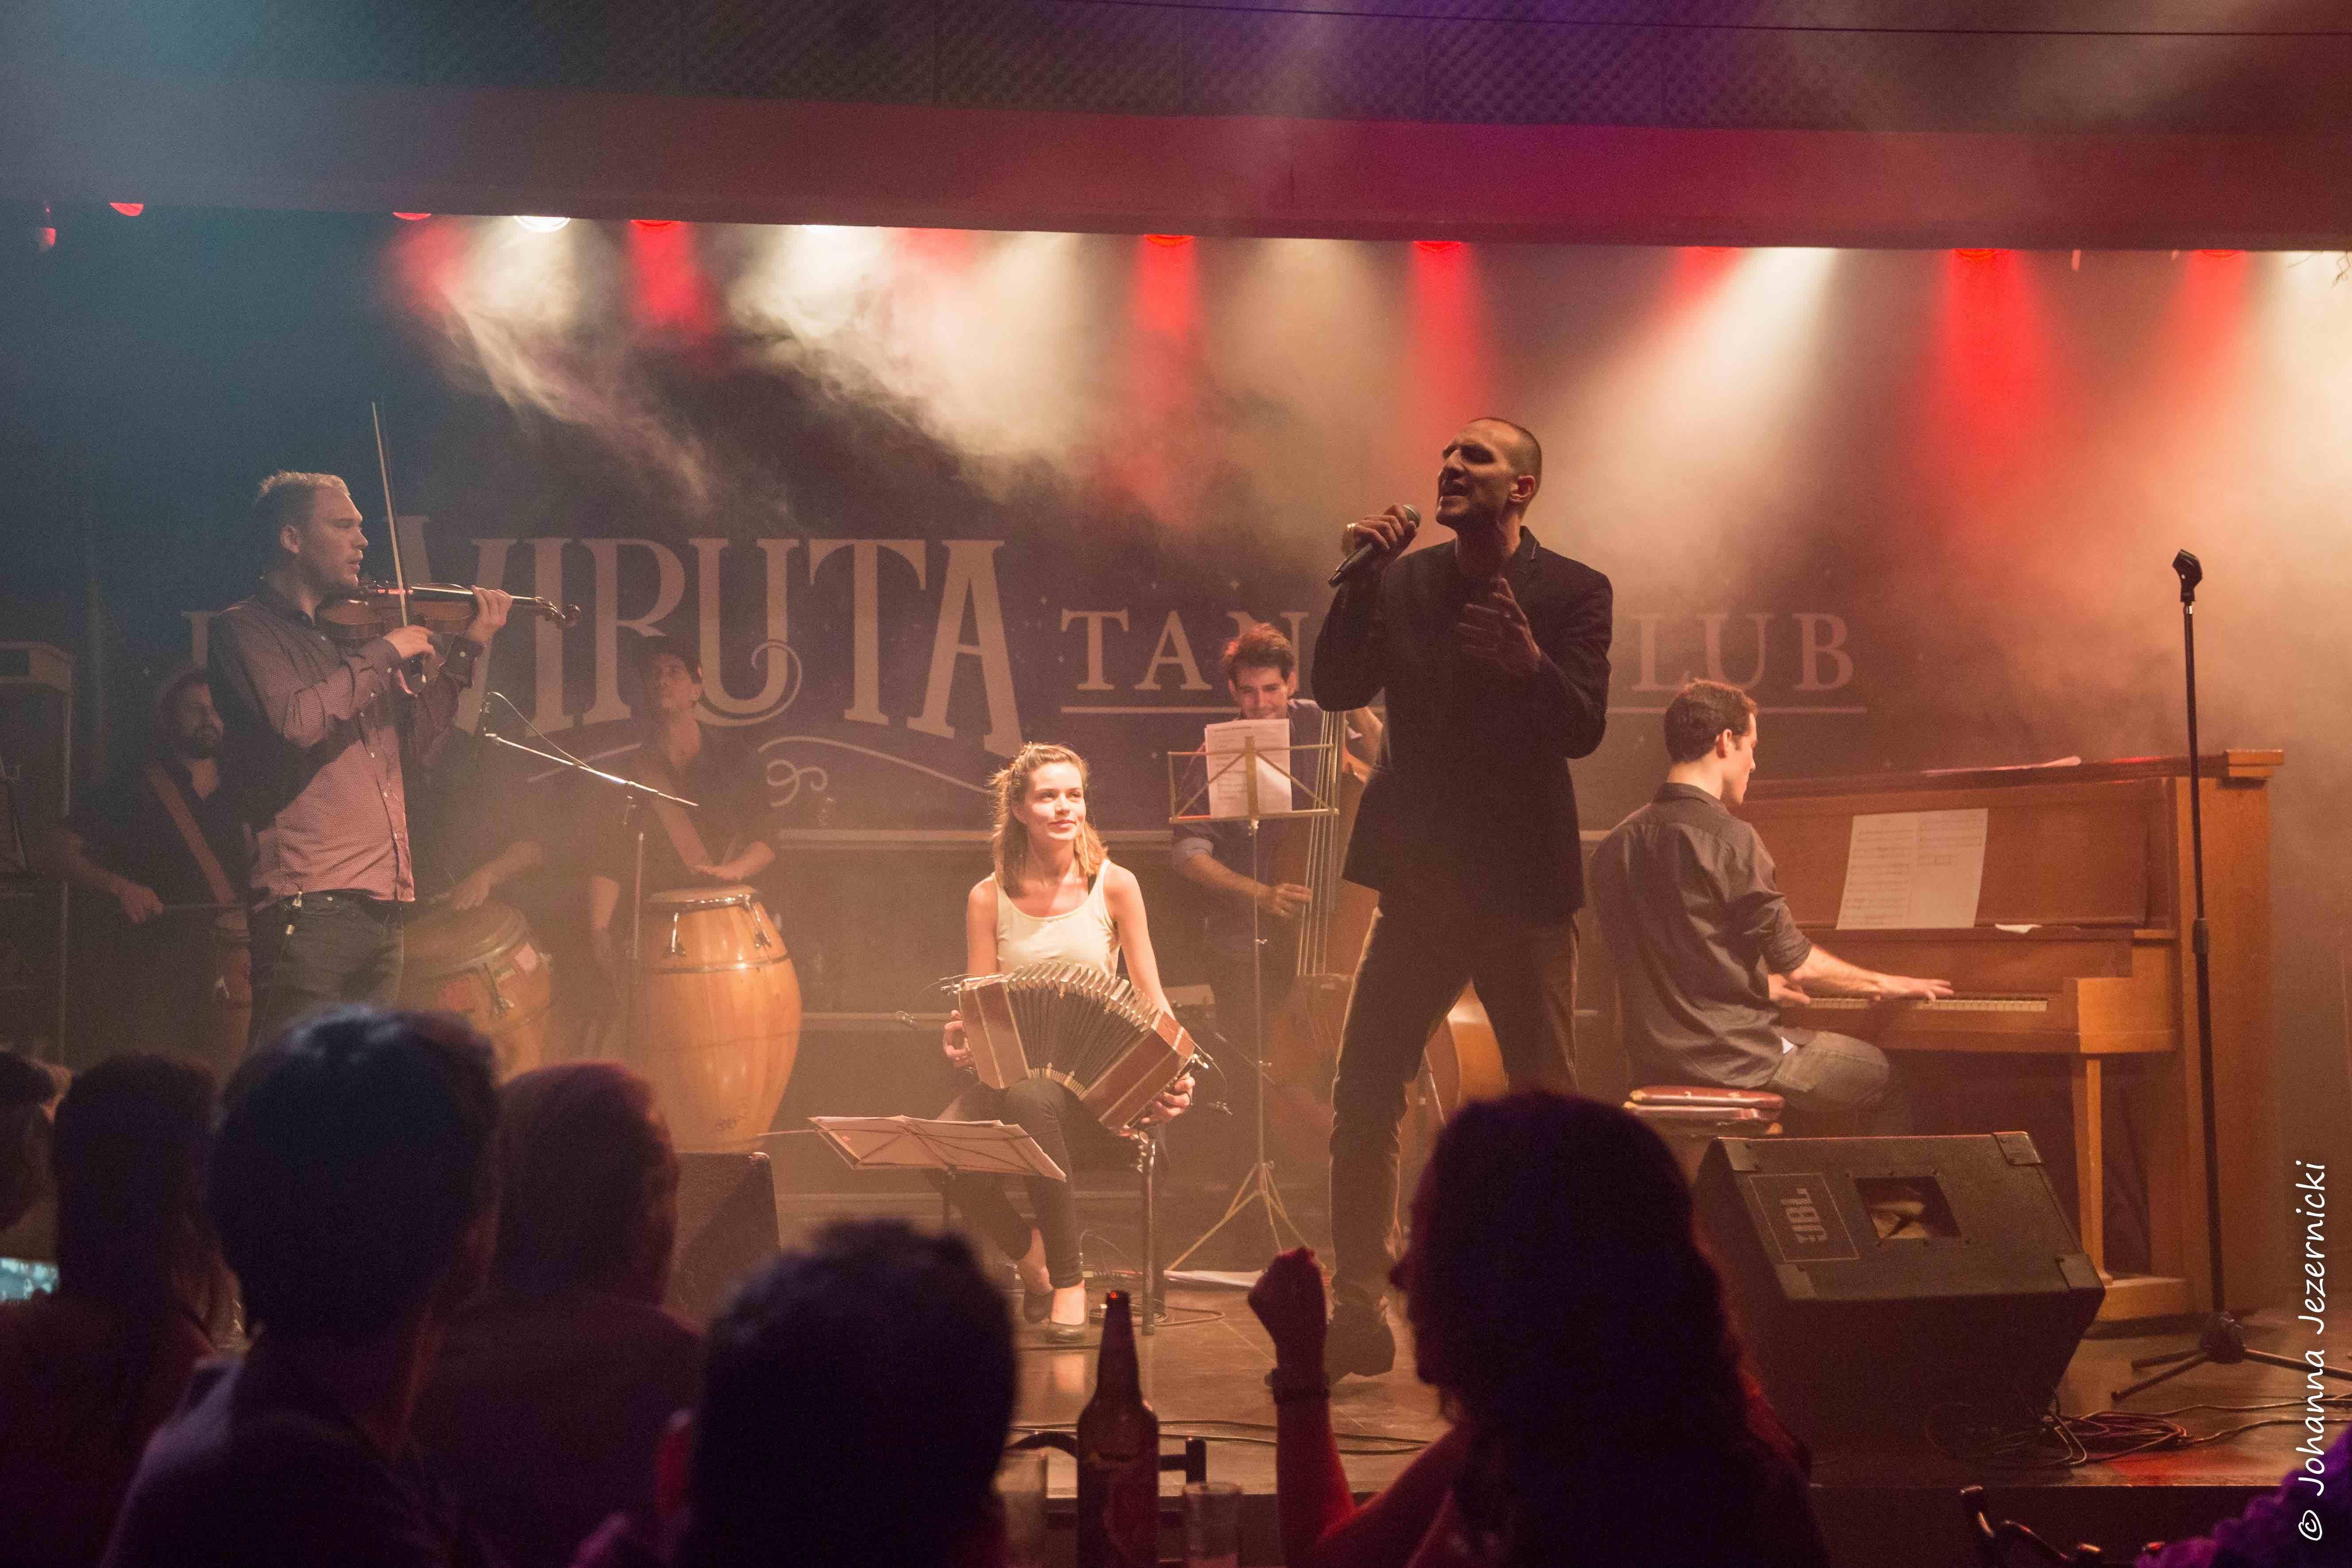 El Muro mit Juan Villarreal im Viruta Tango Club